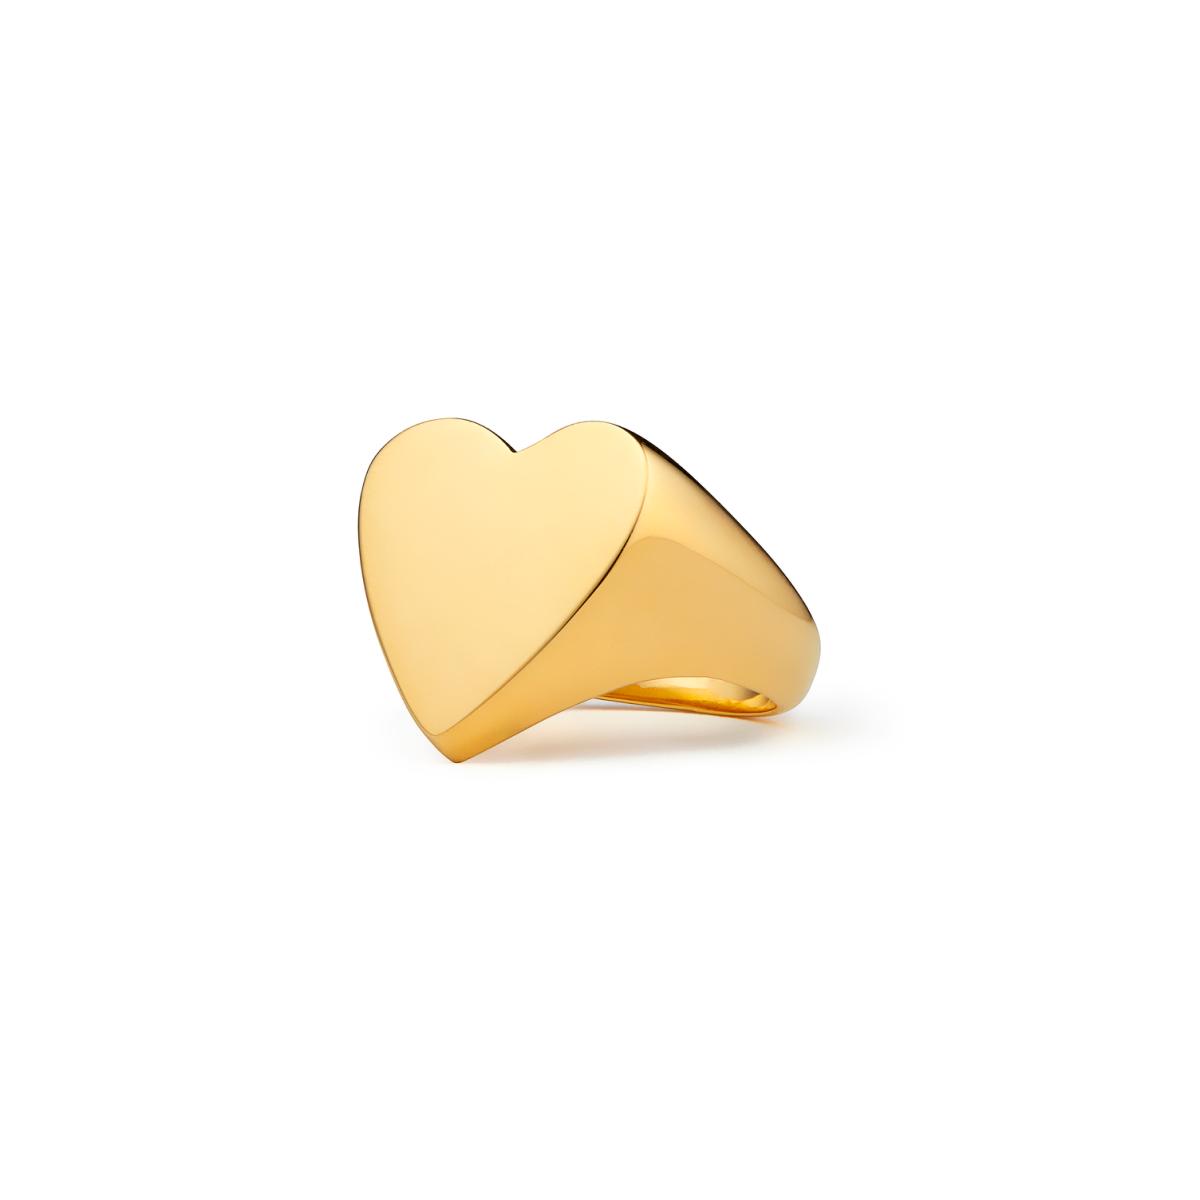 Sophie Buhai GOLD HEART RING